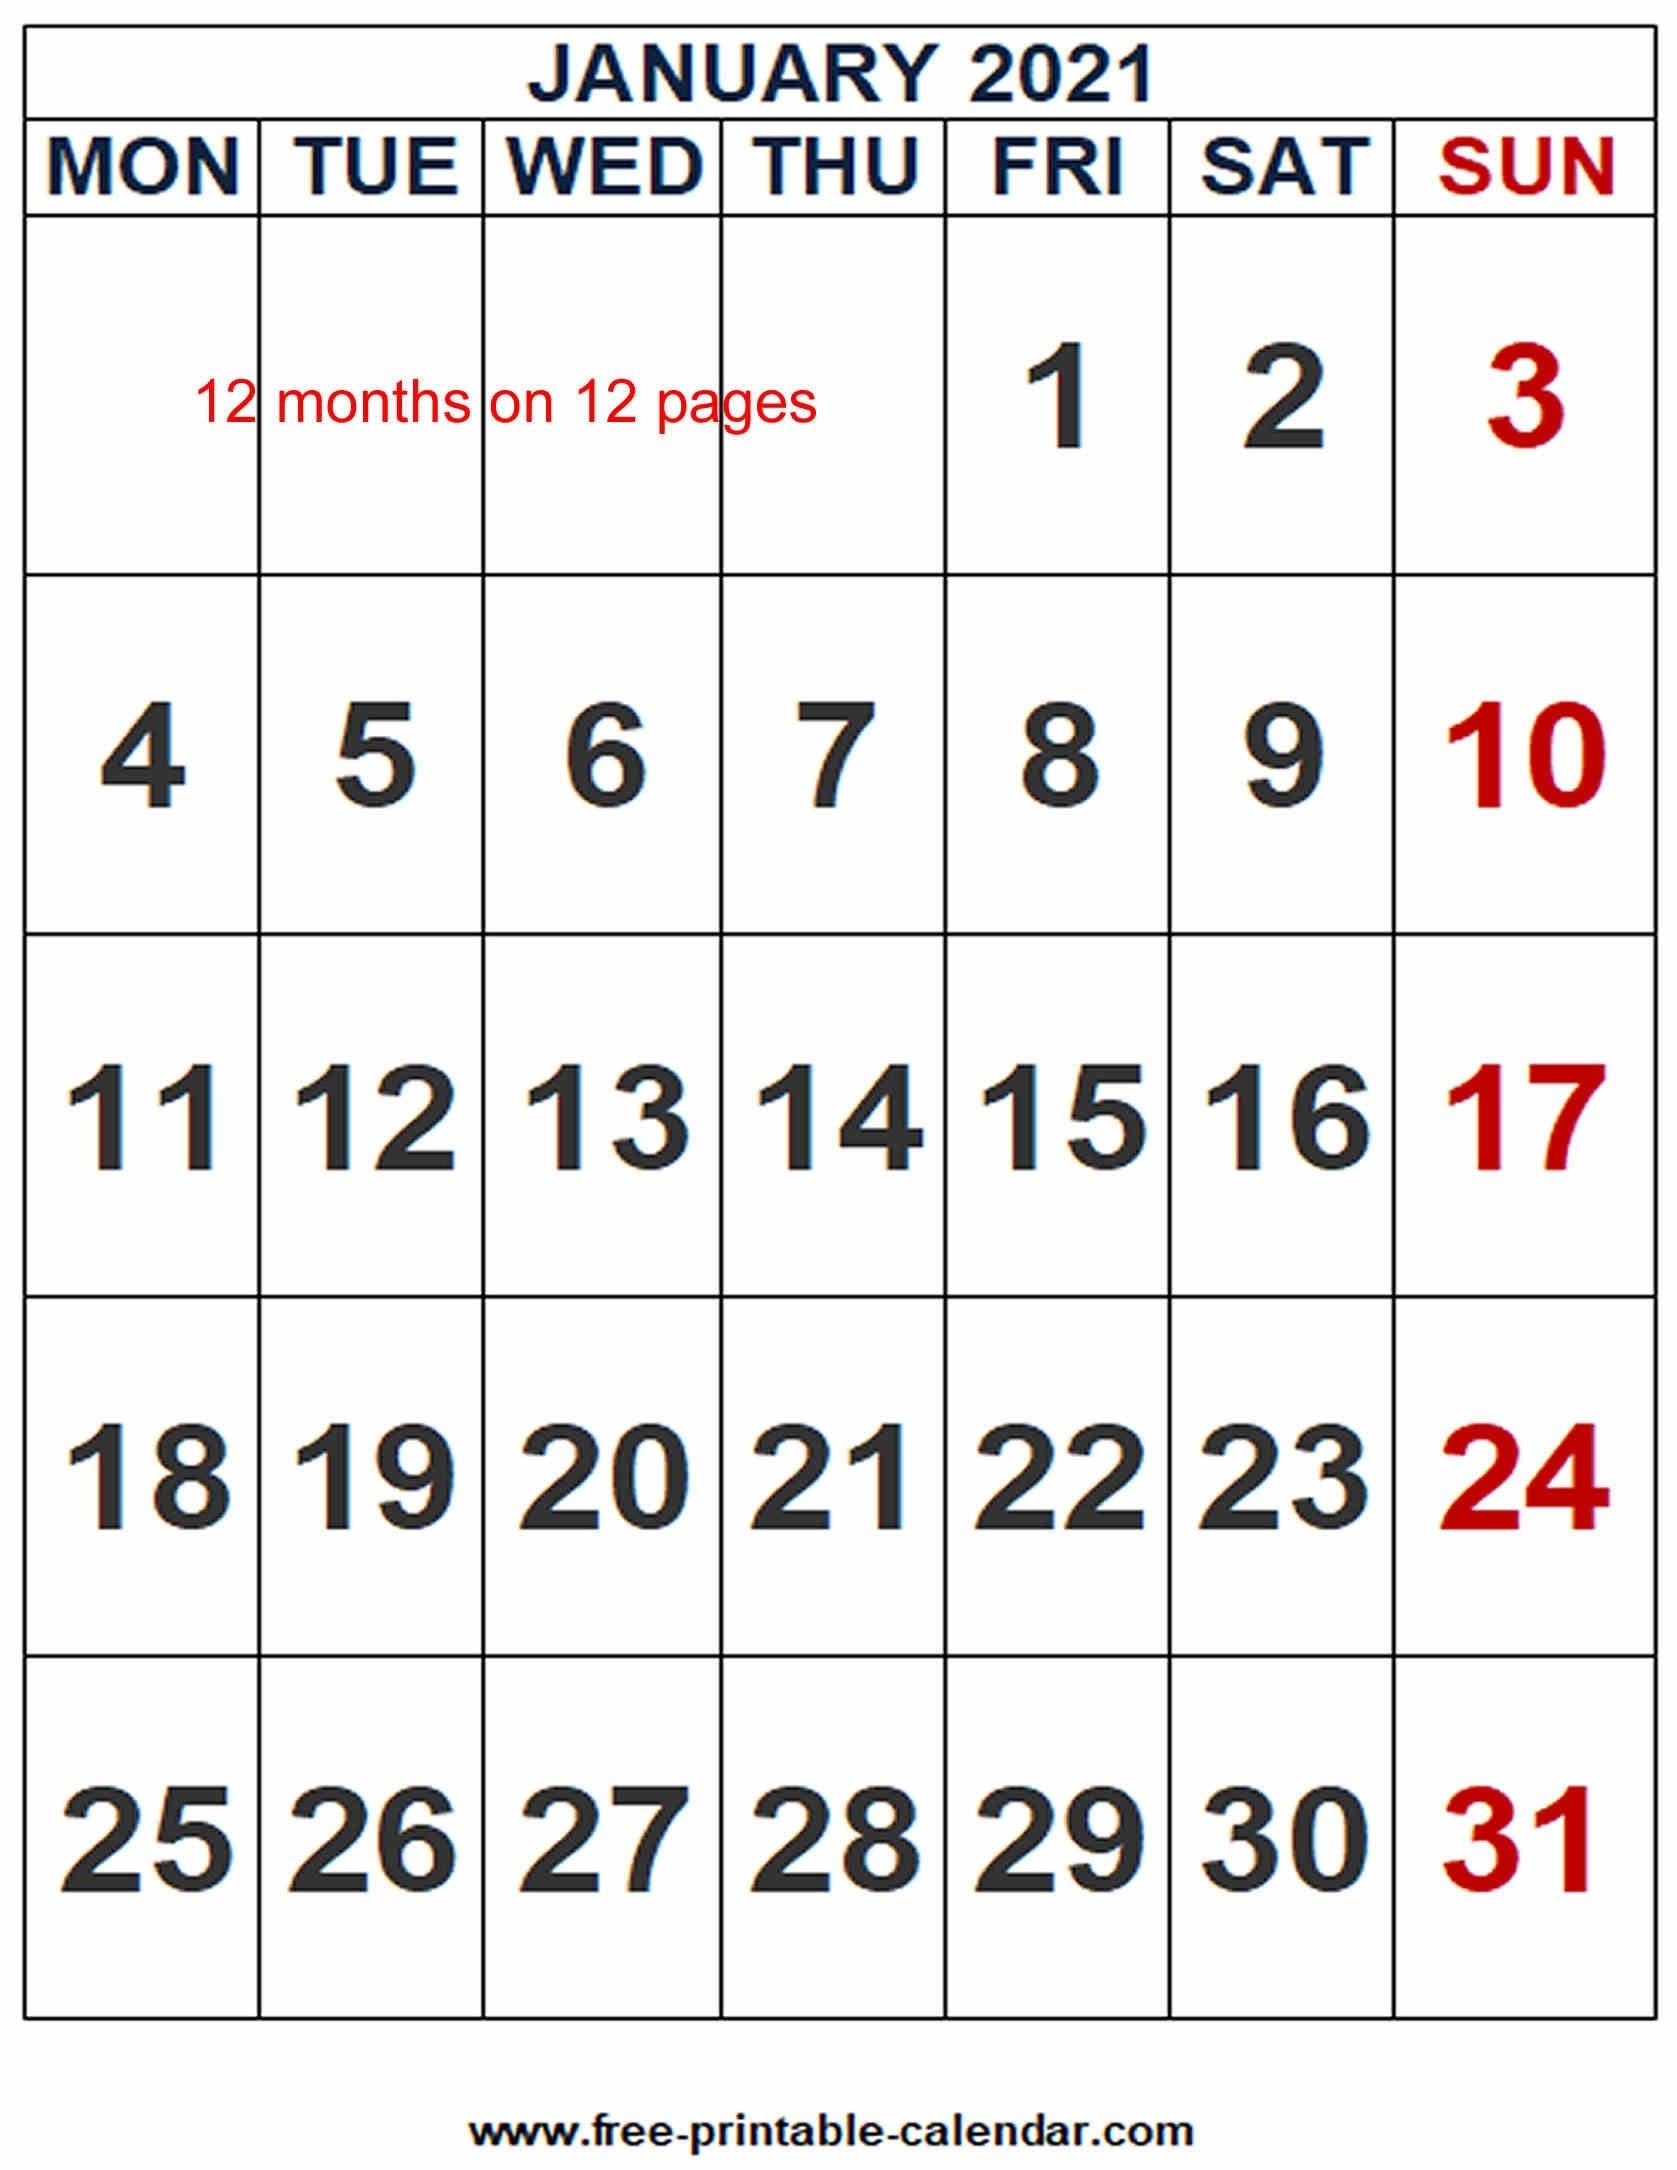 2021 Calendar Word Template - Free-Printable-Calendar Free Calendars 2021 Word Doc Printable August